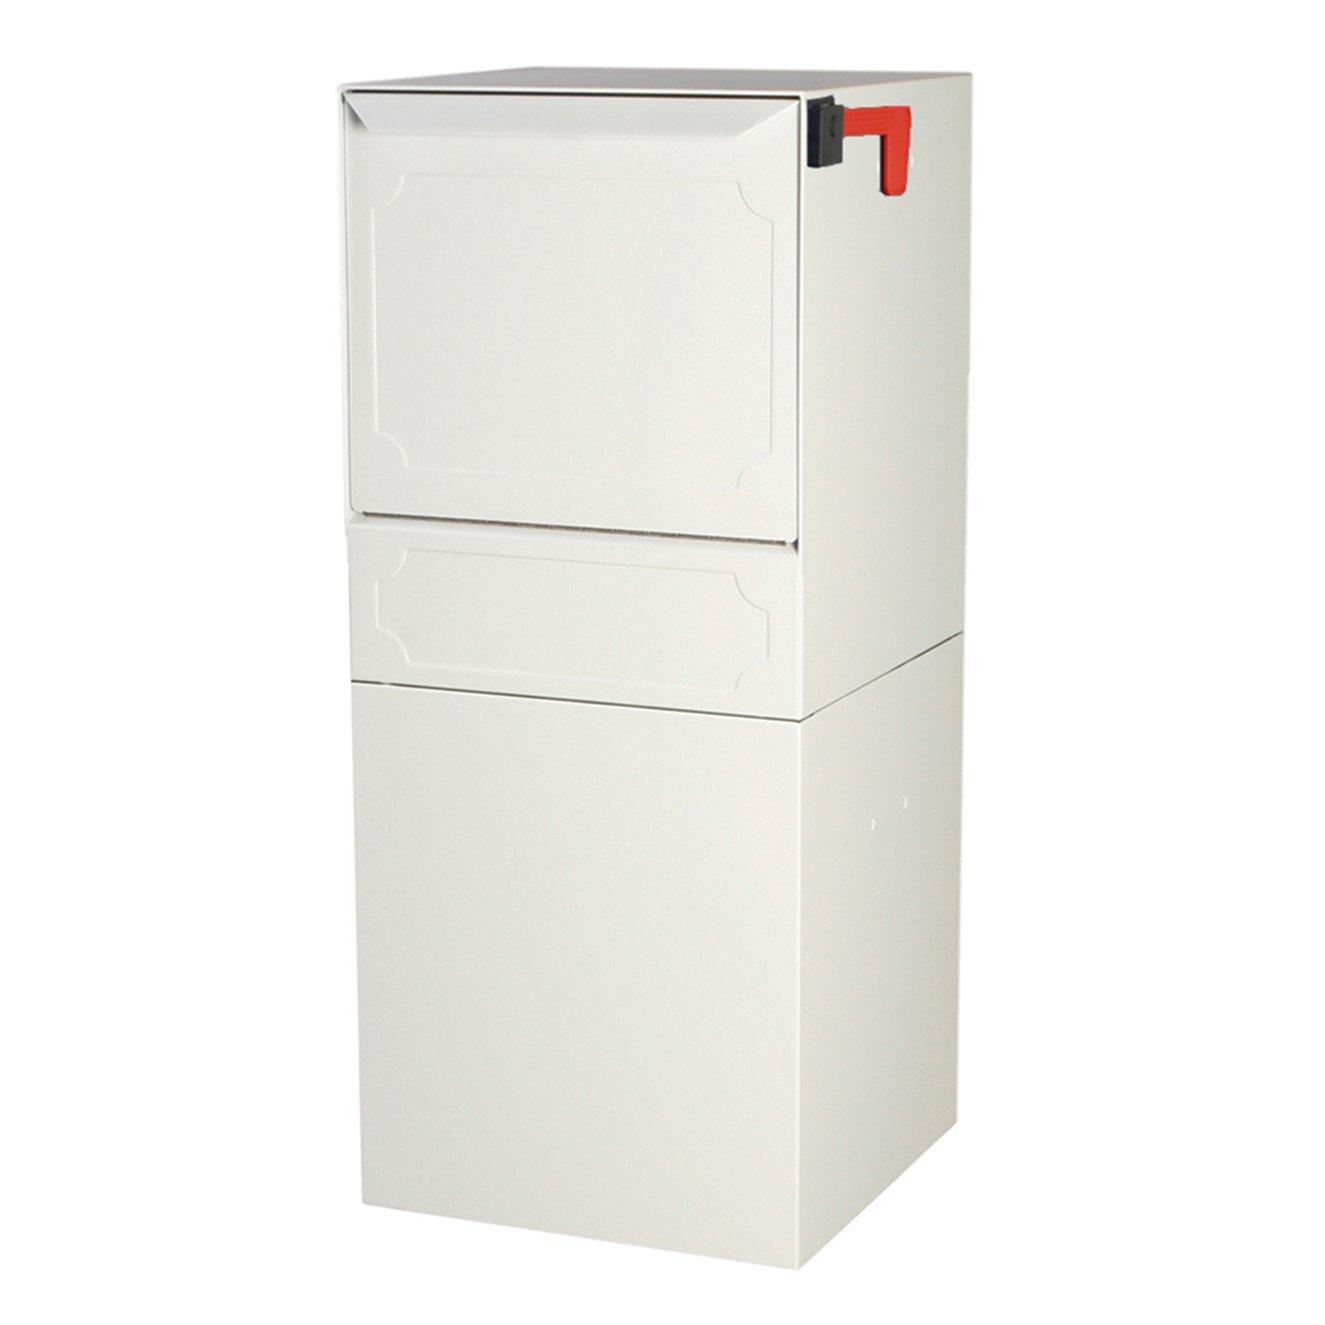 dVault® Parcel Protector Vault DVU0050 Locking Post/Column Mount Mailbox (White)